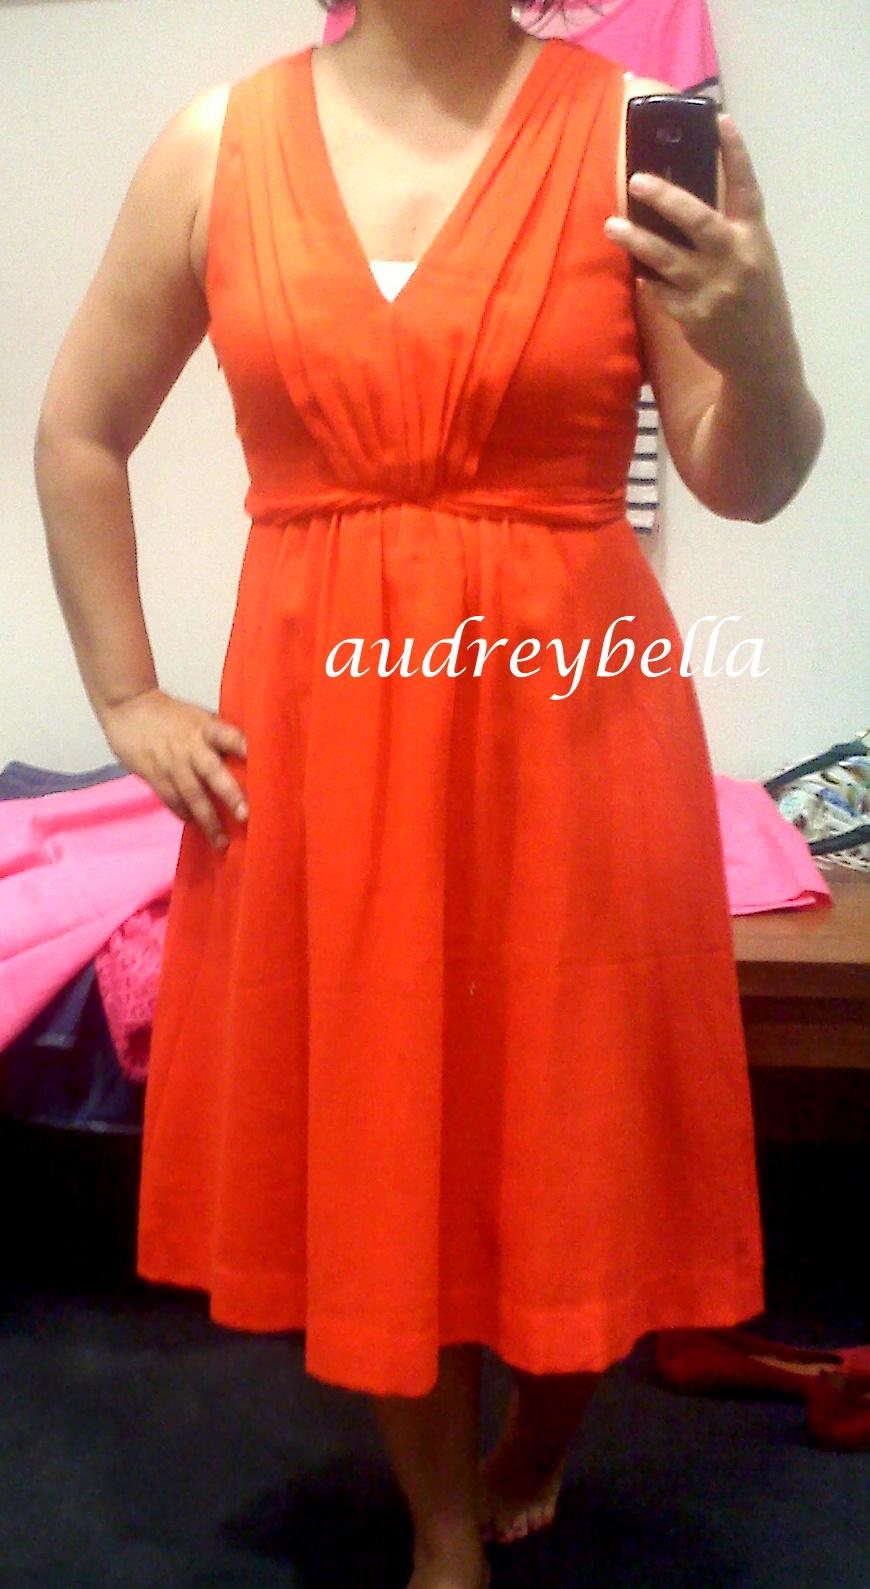 e461dd312804e jeweled-shoes-snag-on-wedding-dress.html in ysazyxu.github.com ...